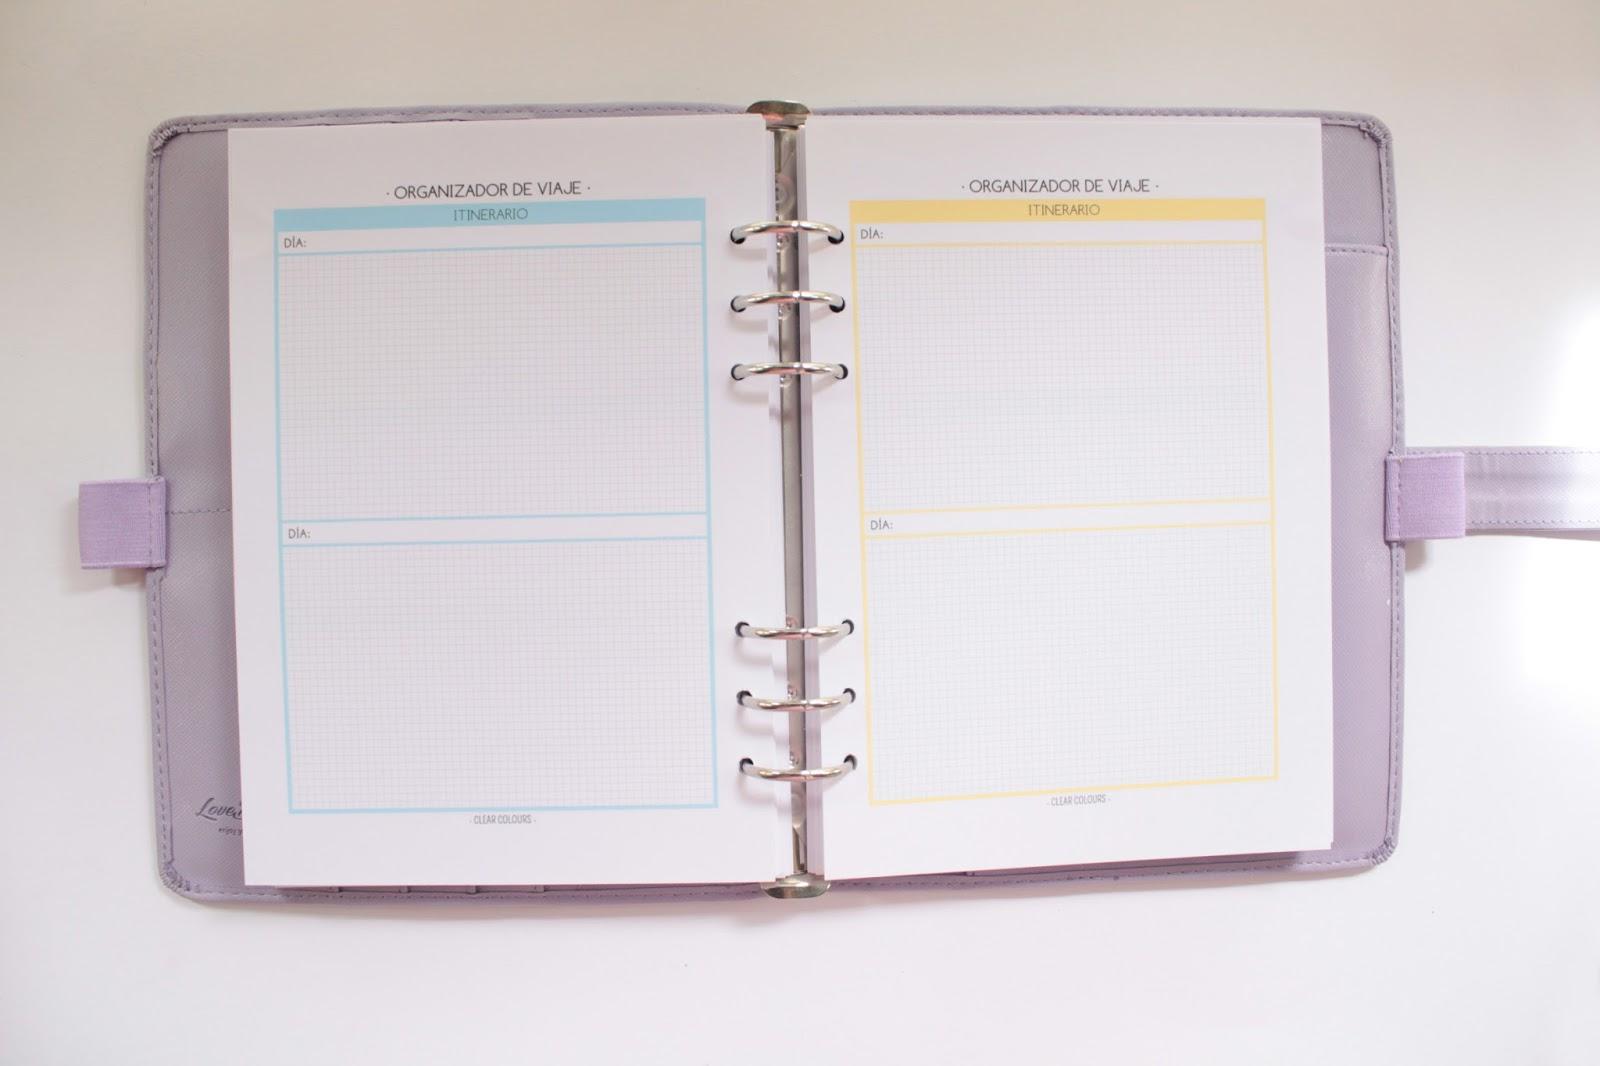 formato agenda - Jcmanagement.co